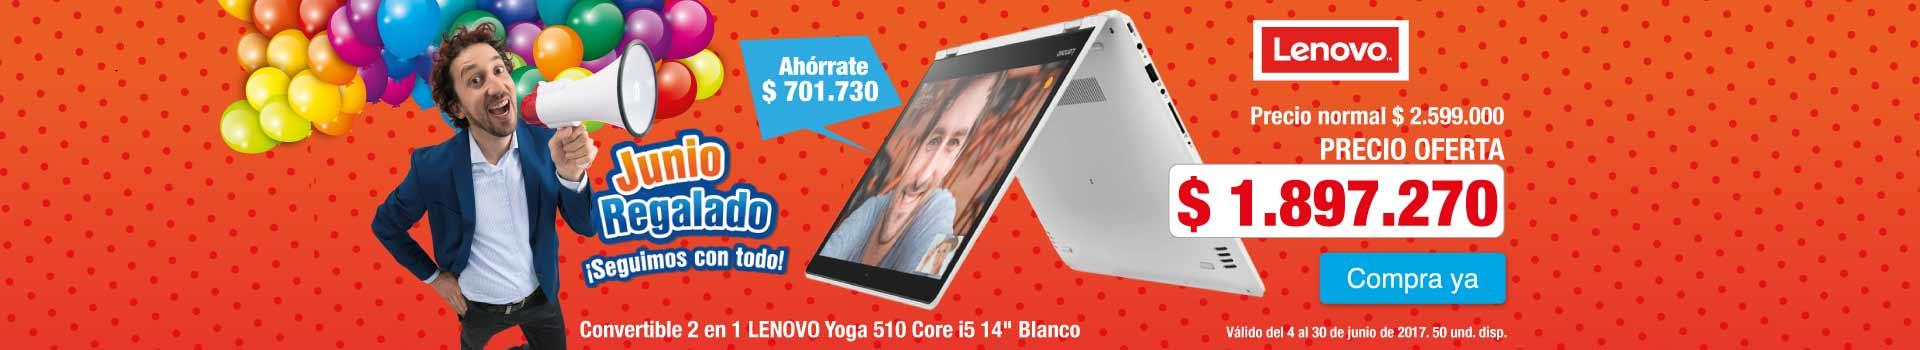 CAT AK INF - Convertible 2 en 1 LENOVO Yoga 510 Core i5 14